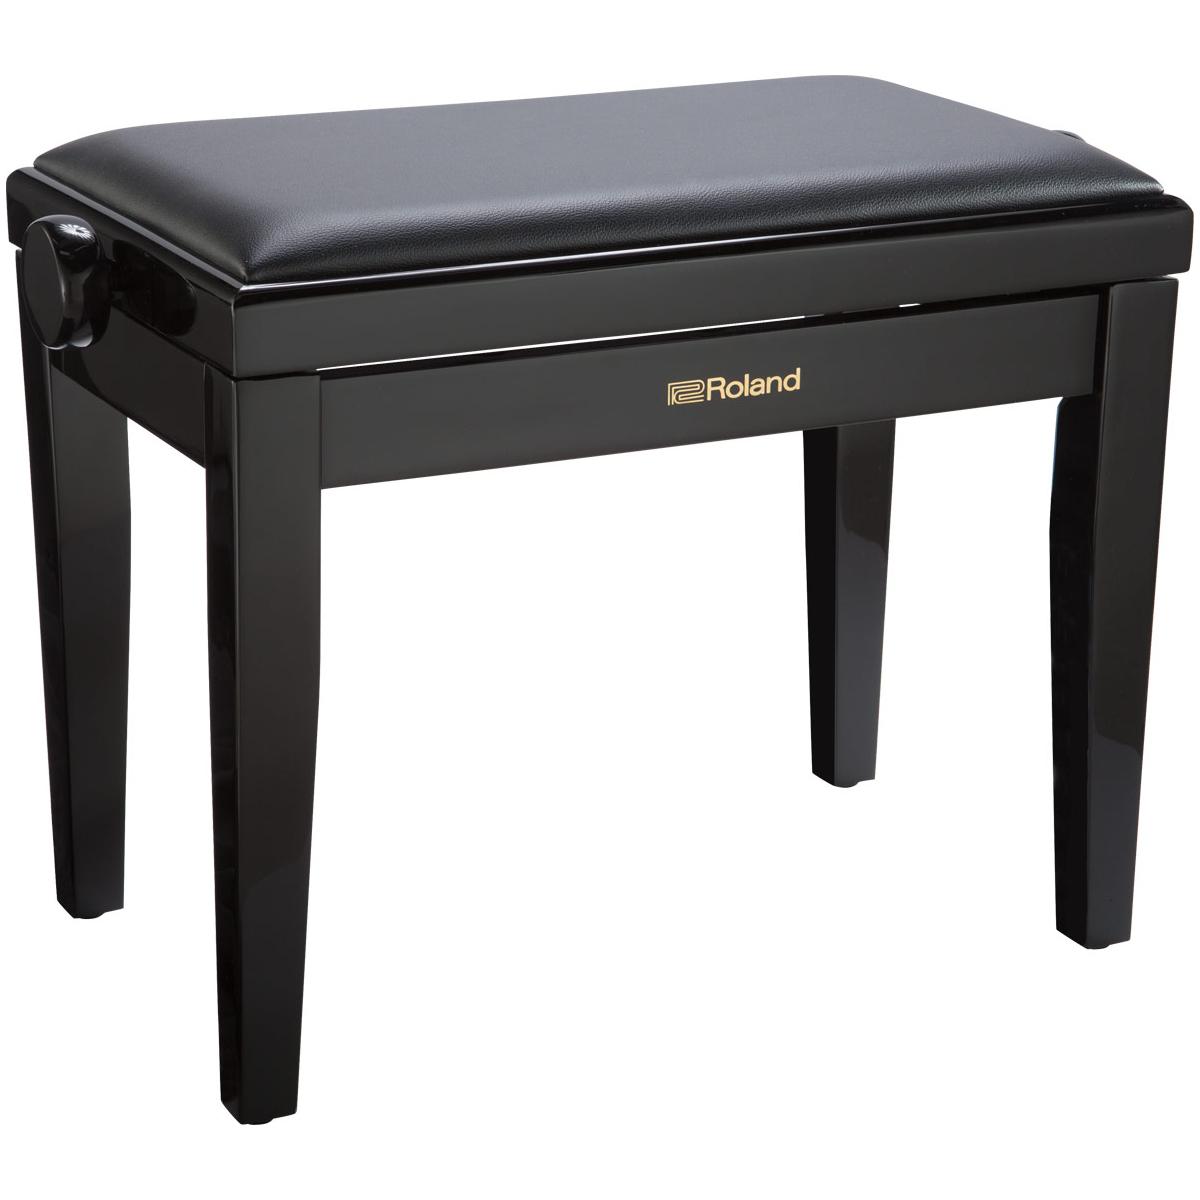 Banquettes pianos - Roland - RPB-200PE (NOIR LAQUÉ)